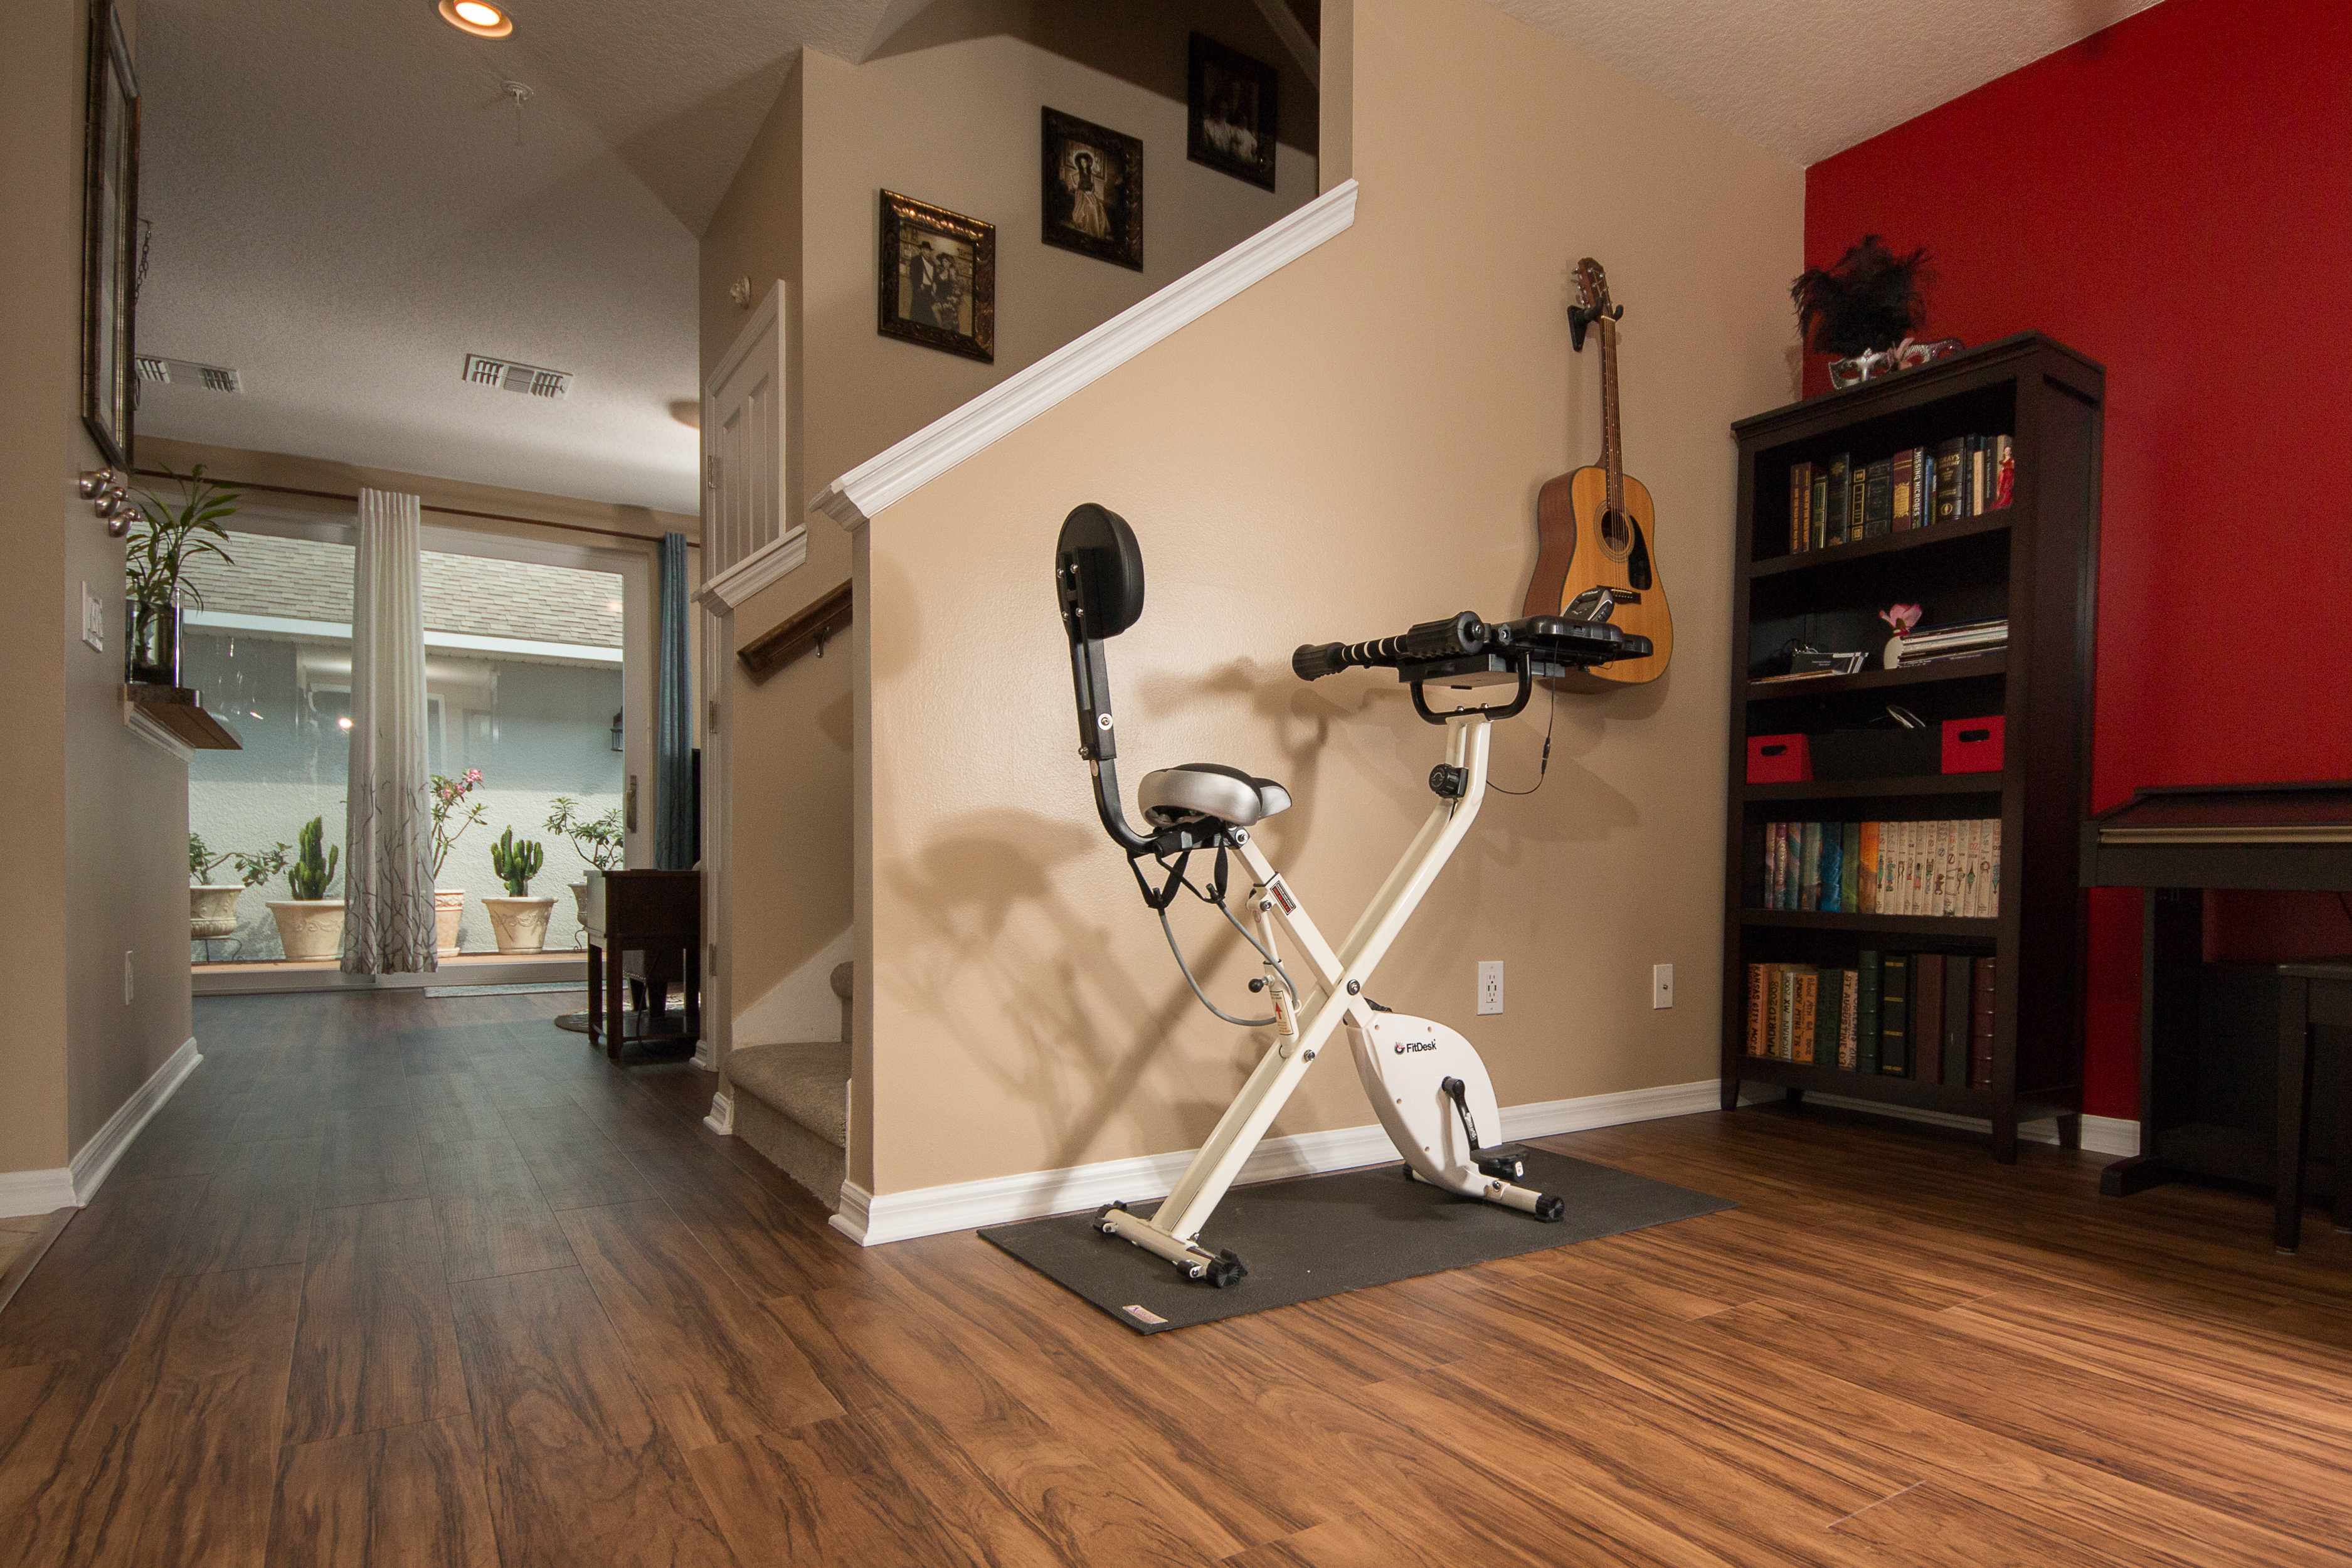 PVC Vinyl & Gray Carpet flooring workout area